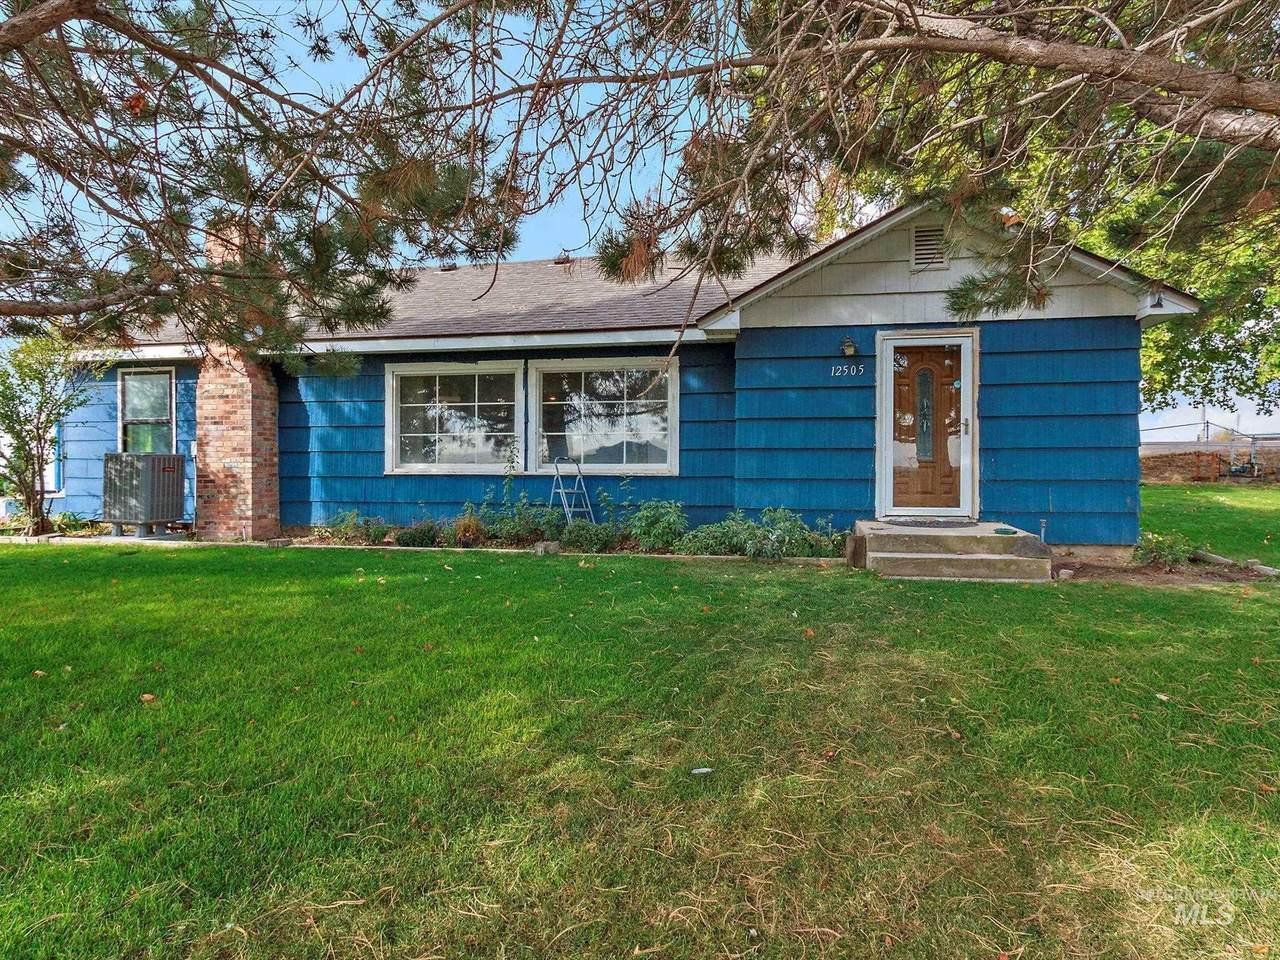 12505 Missouri Ave. - Photo 1